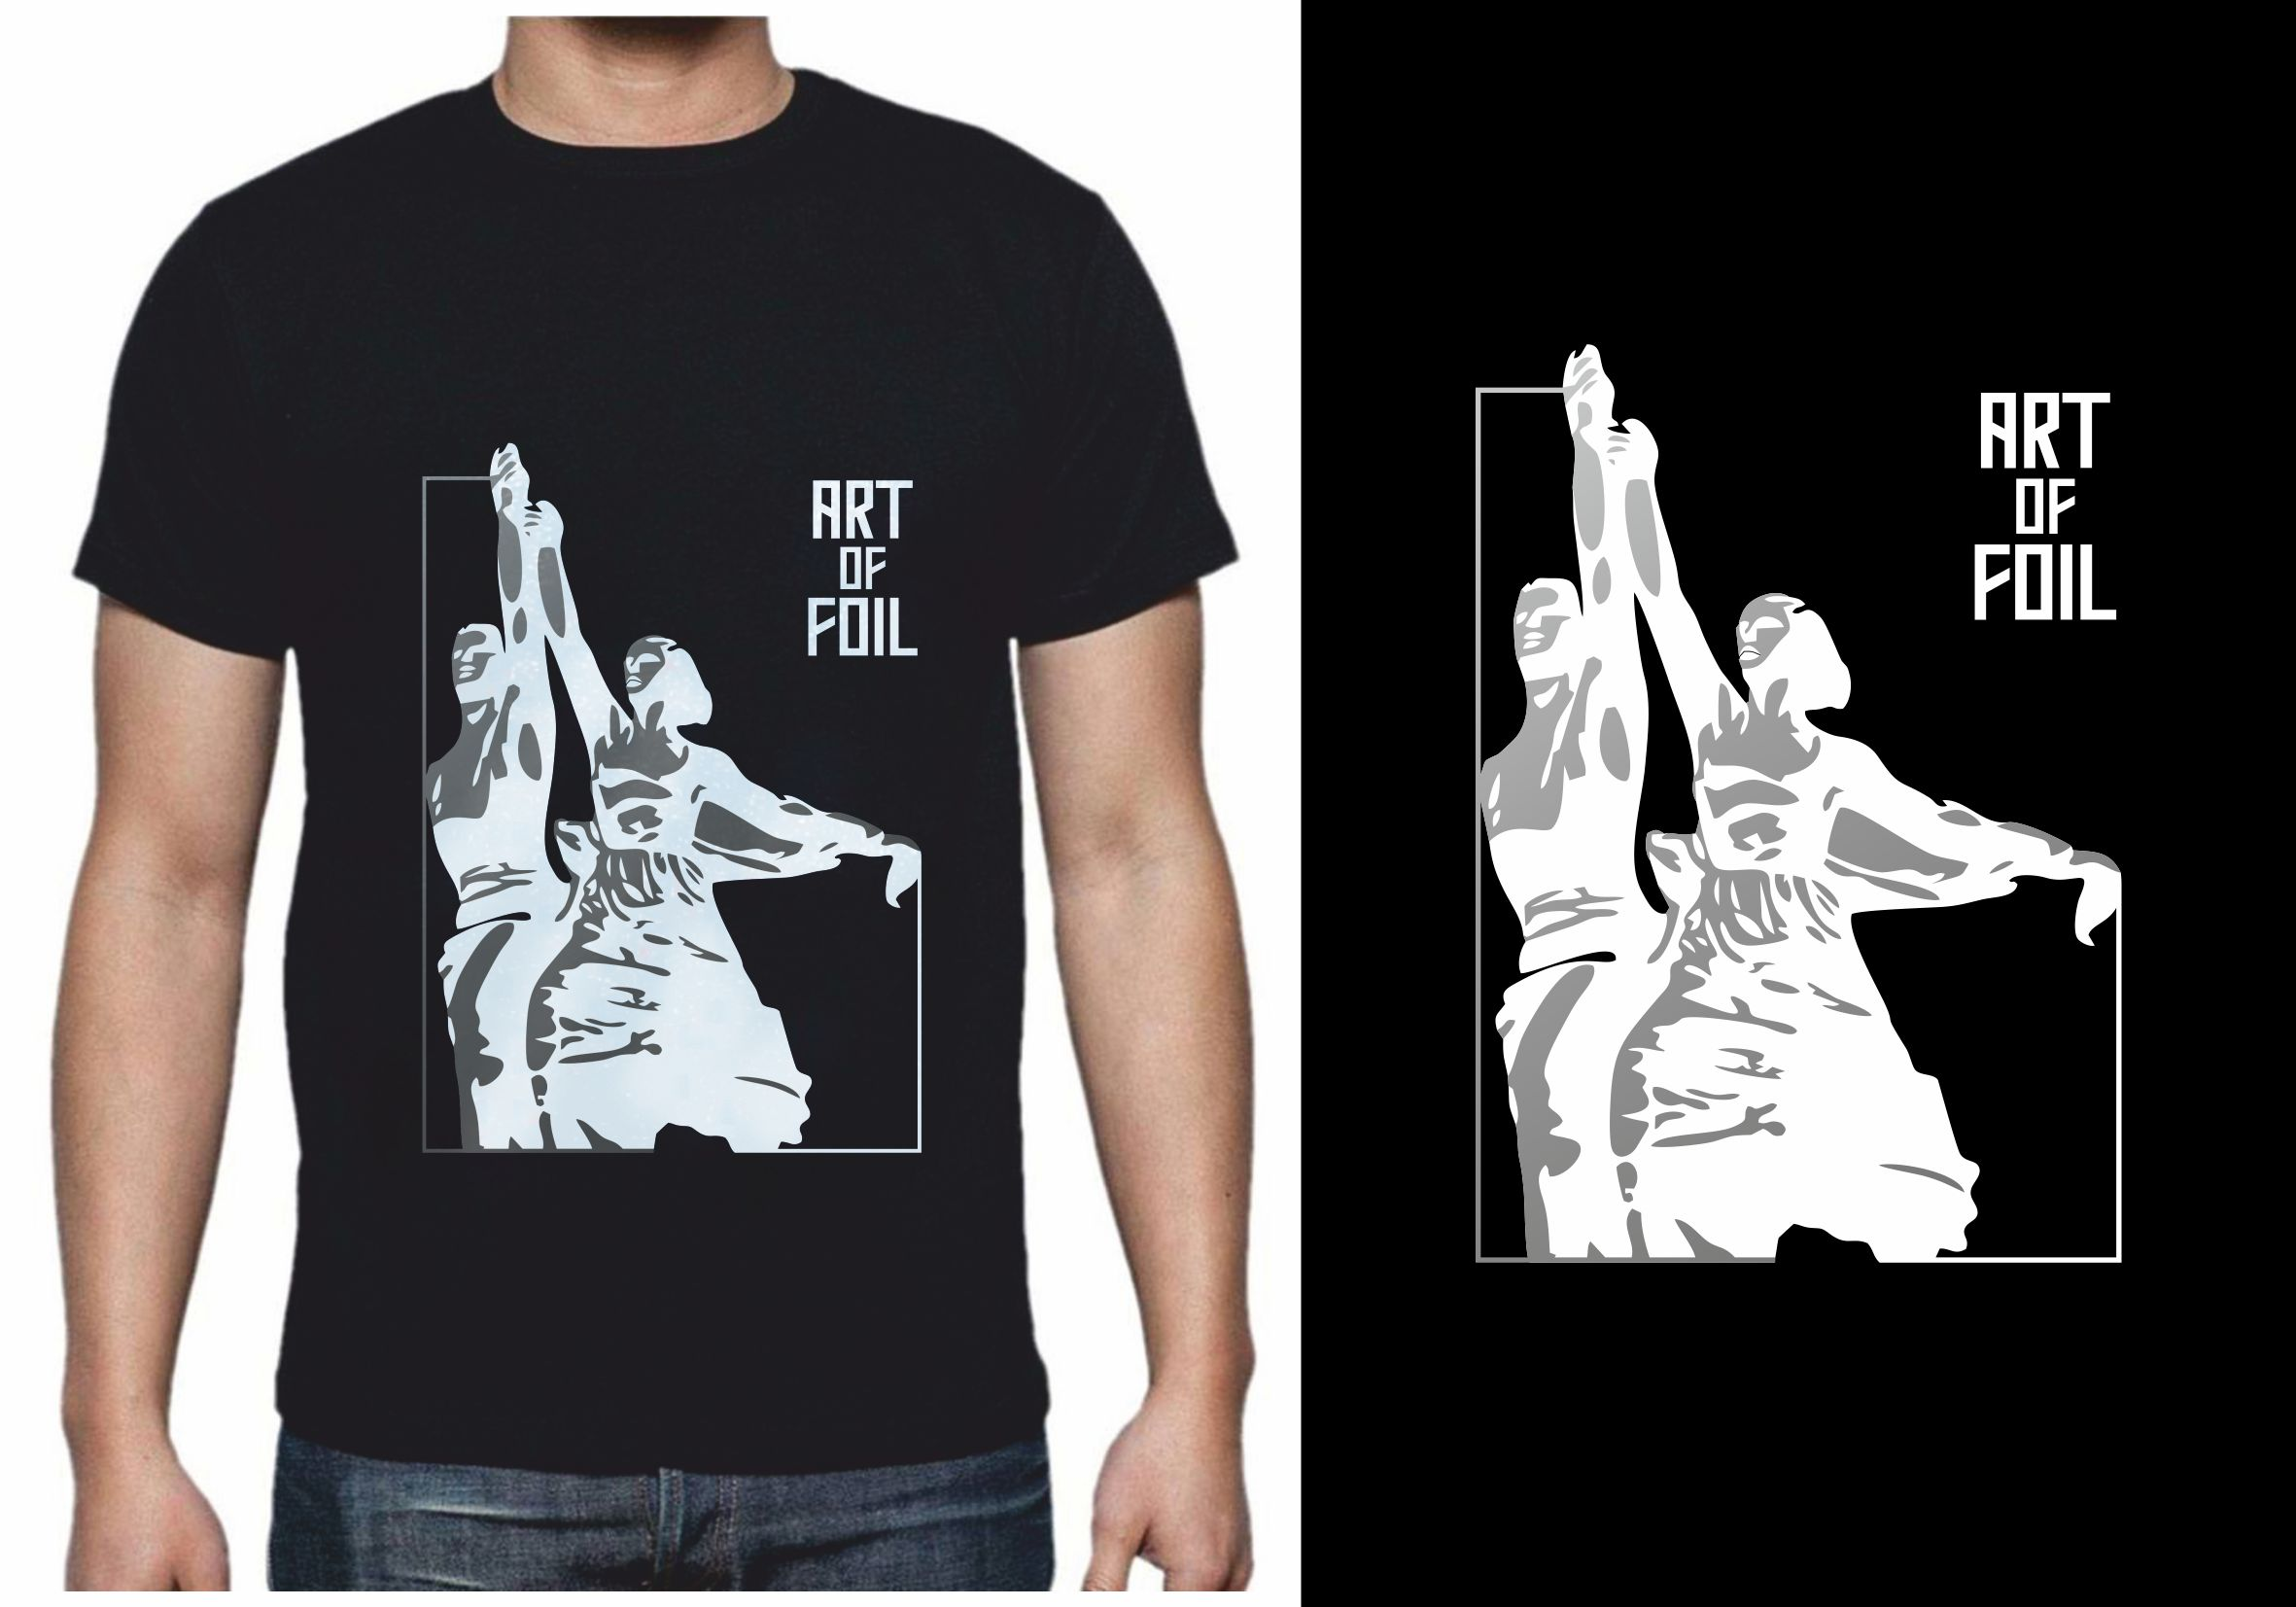 Разработать принт для футболки фото f_4485f63f6019c2a5.jpg